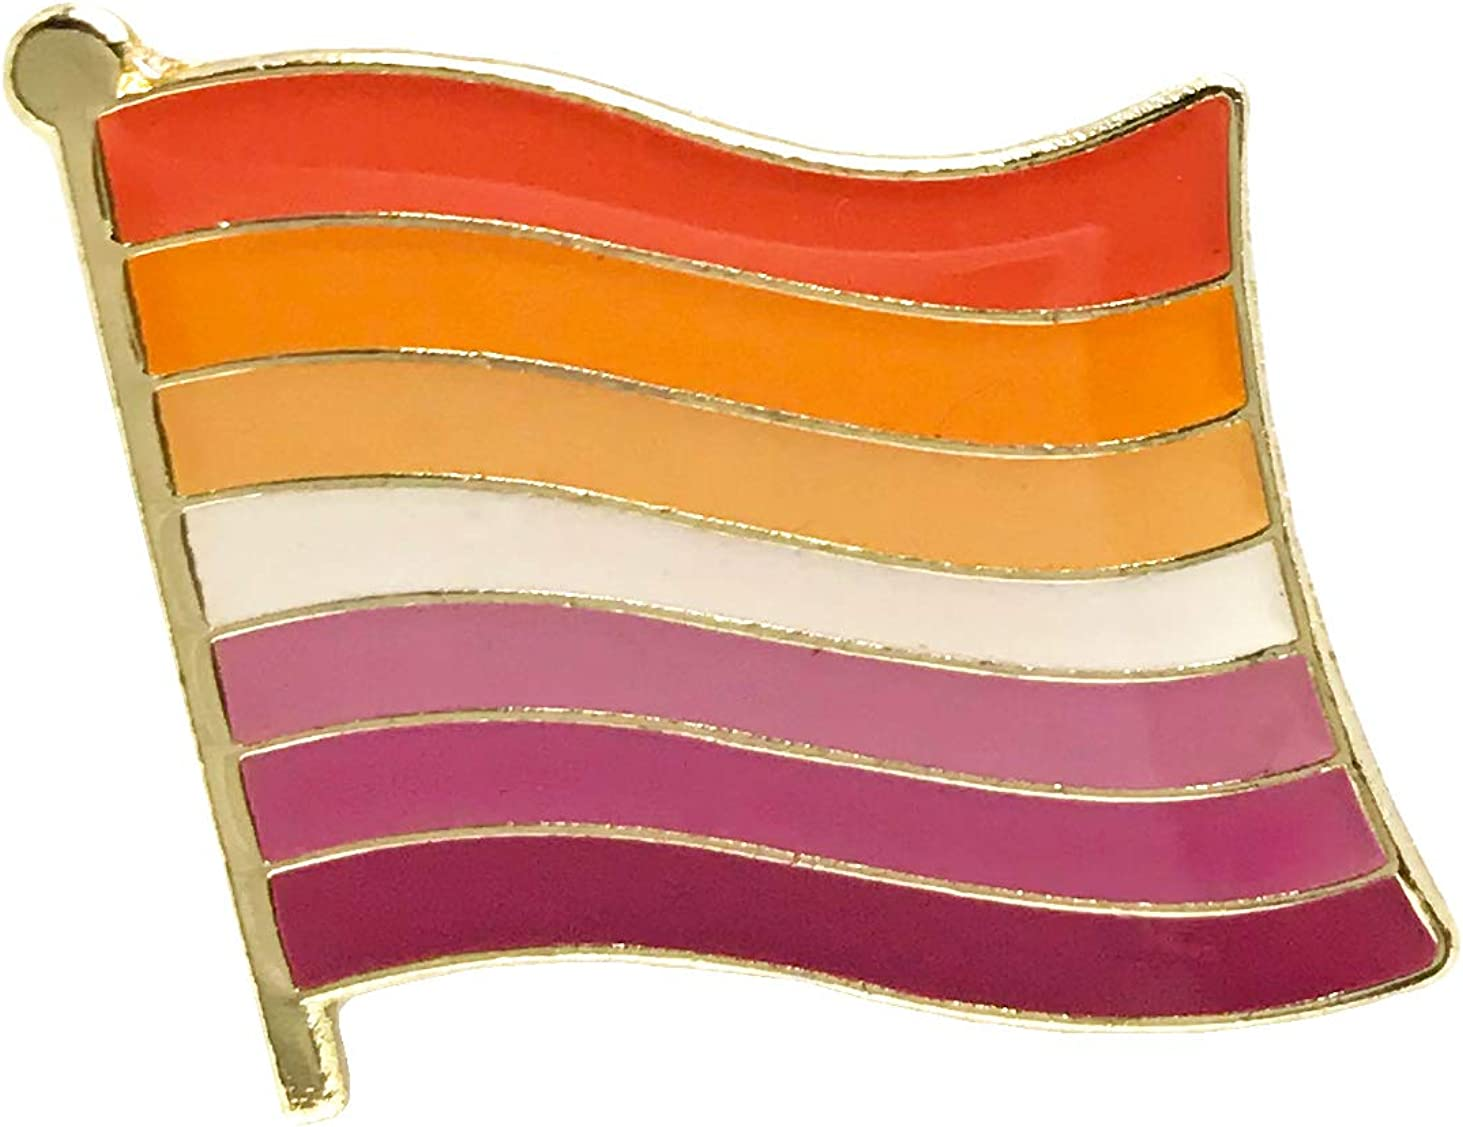 New Lesbian Flag LGBT Gay Pride Rainbow Enamel Lapel Pin